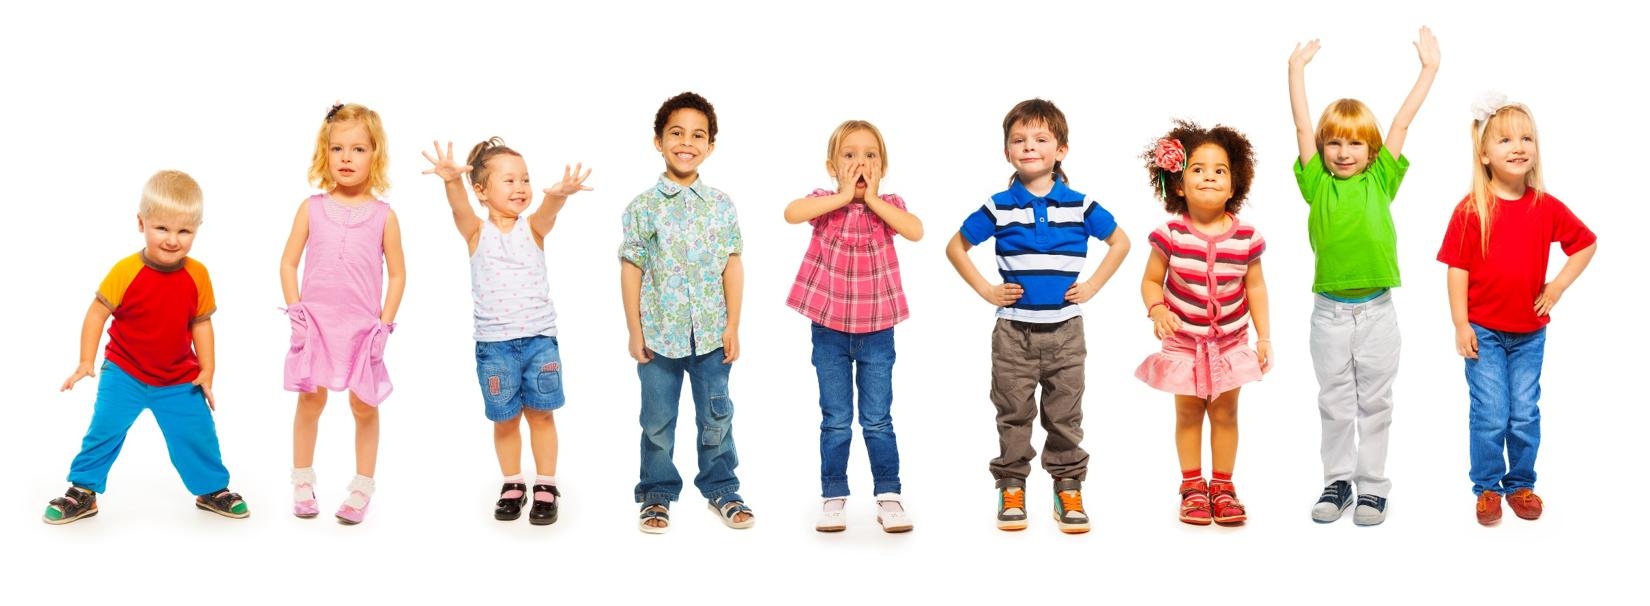 Children Having Fun At School PNG - 167059